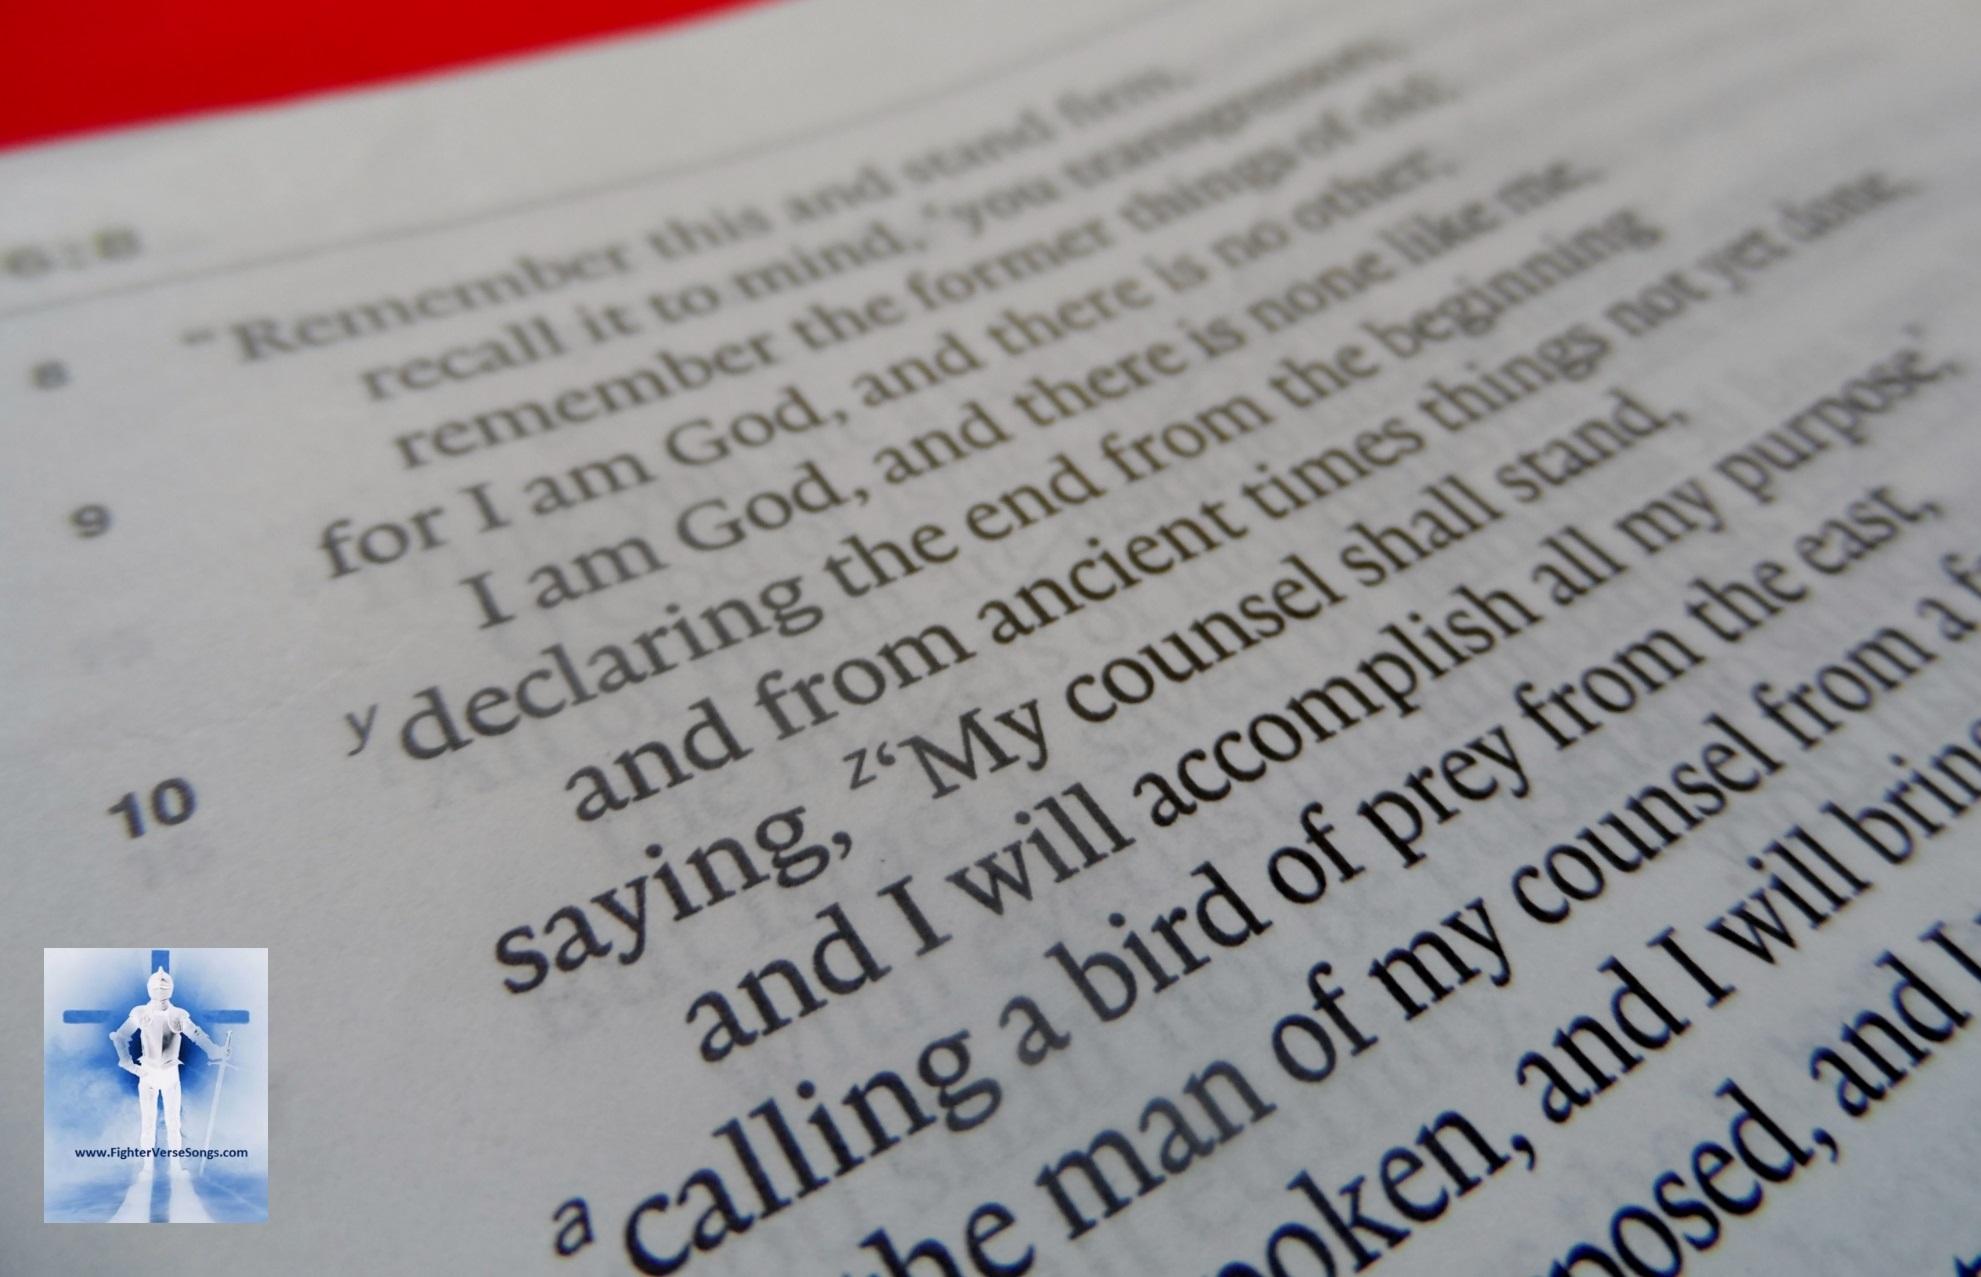 Isaiah 46:9-10